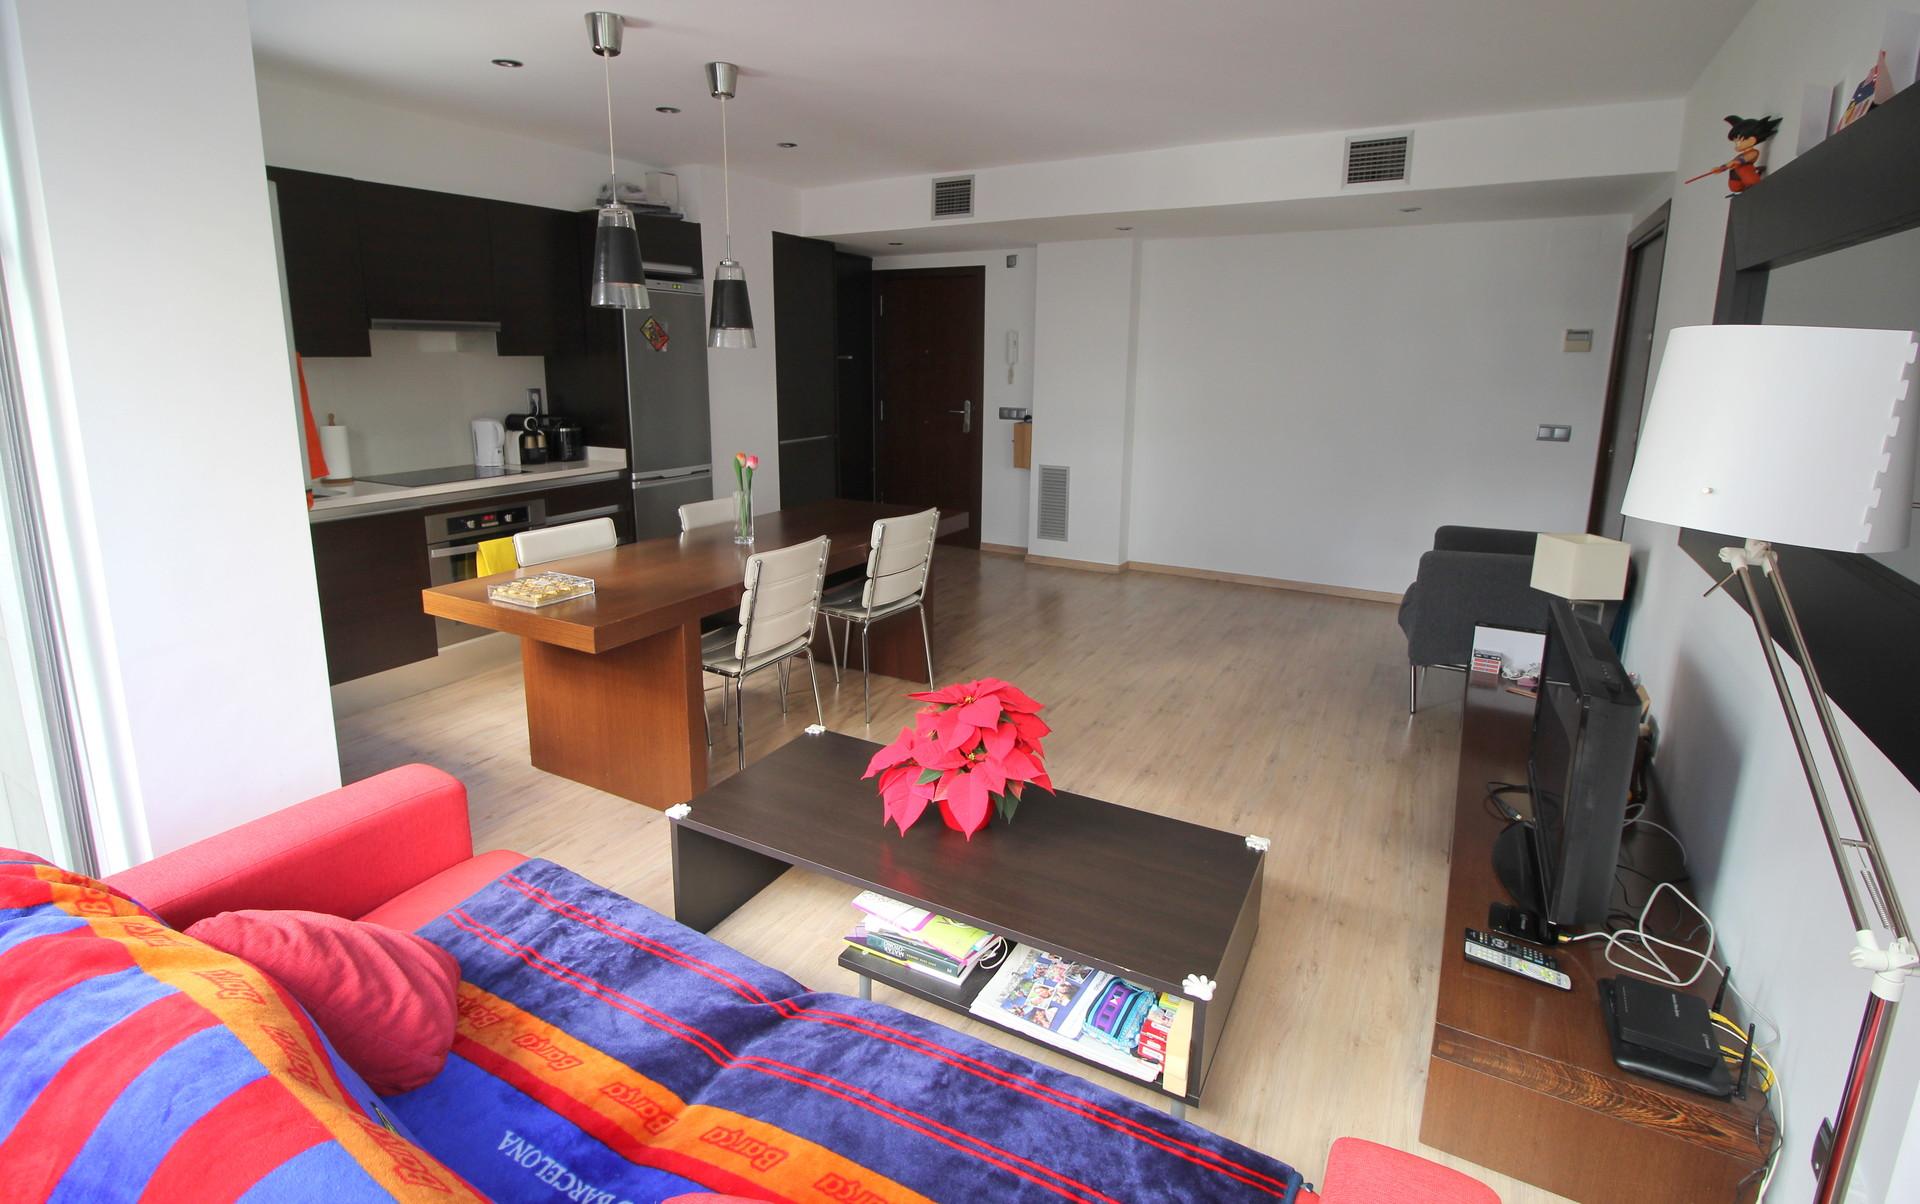 modern-apartment-needs-march-20e71cc76a66ce7f7da4dcd810a056cf